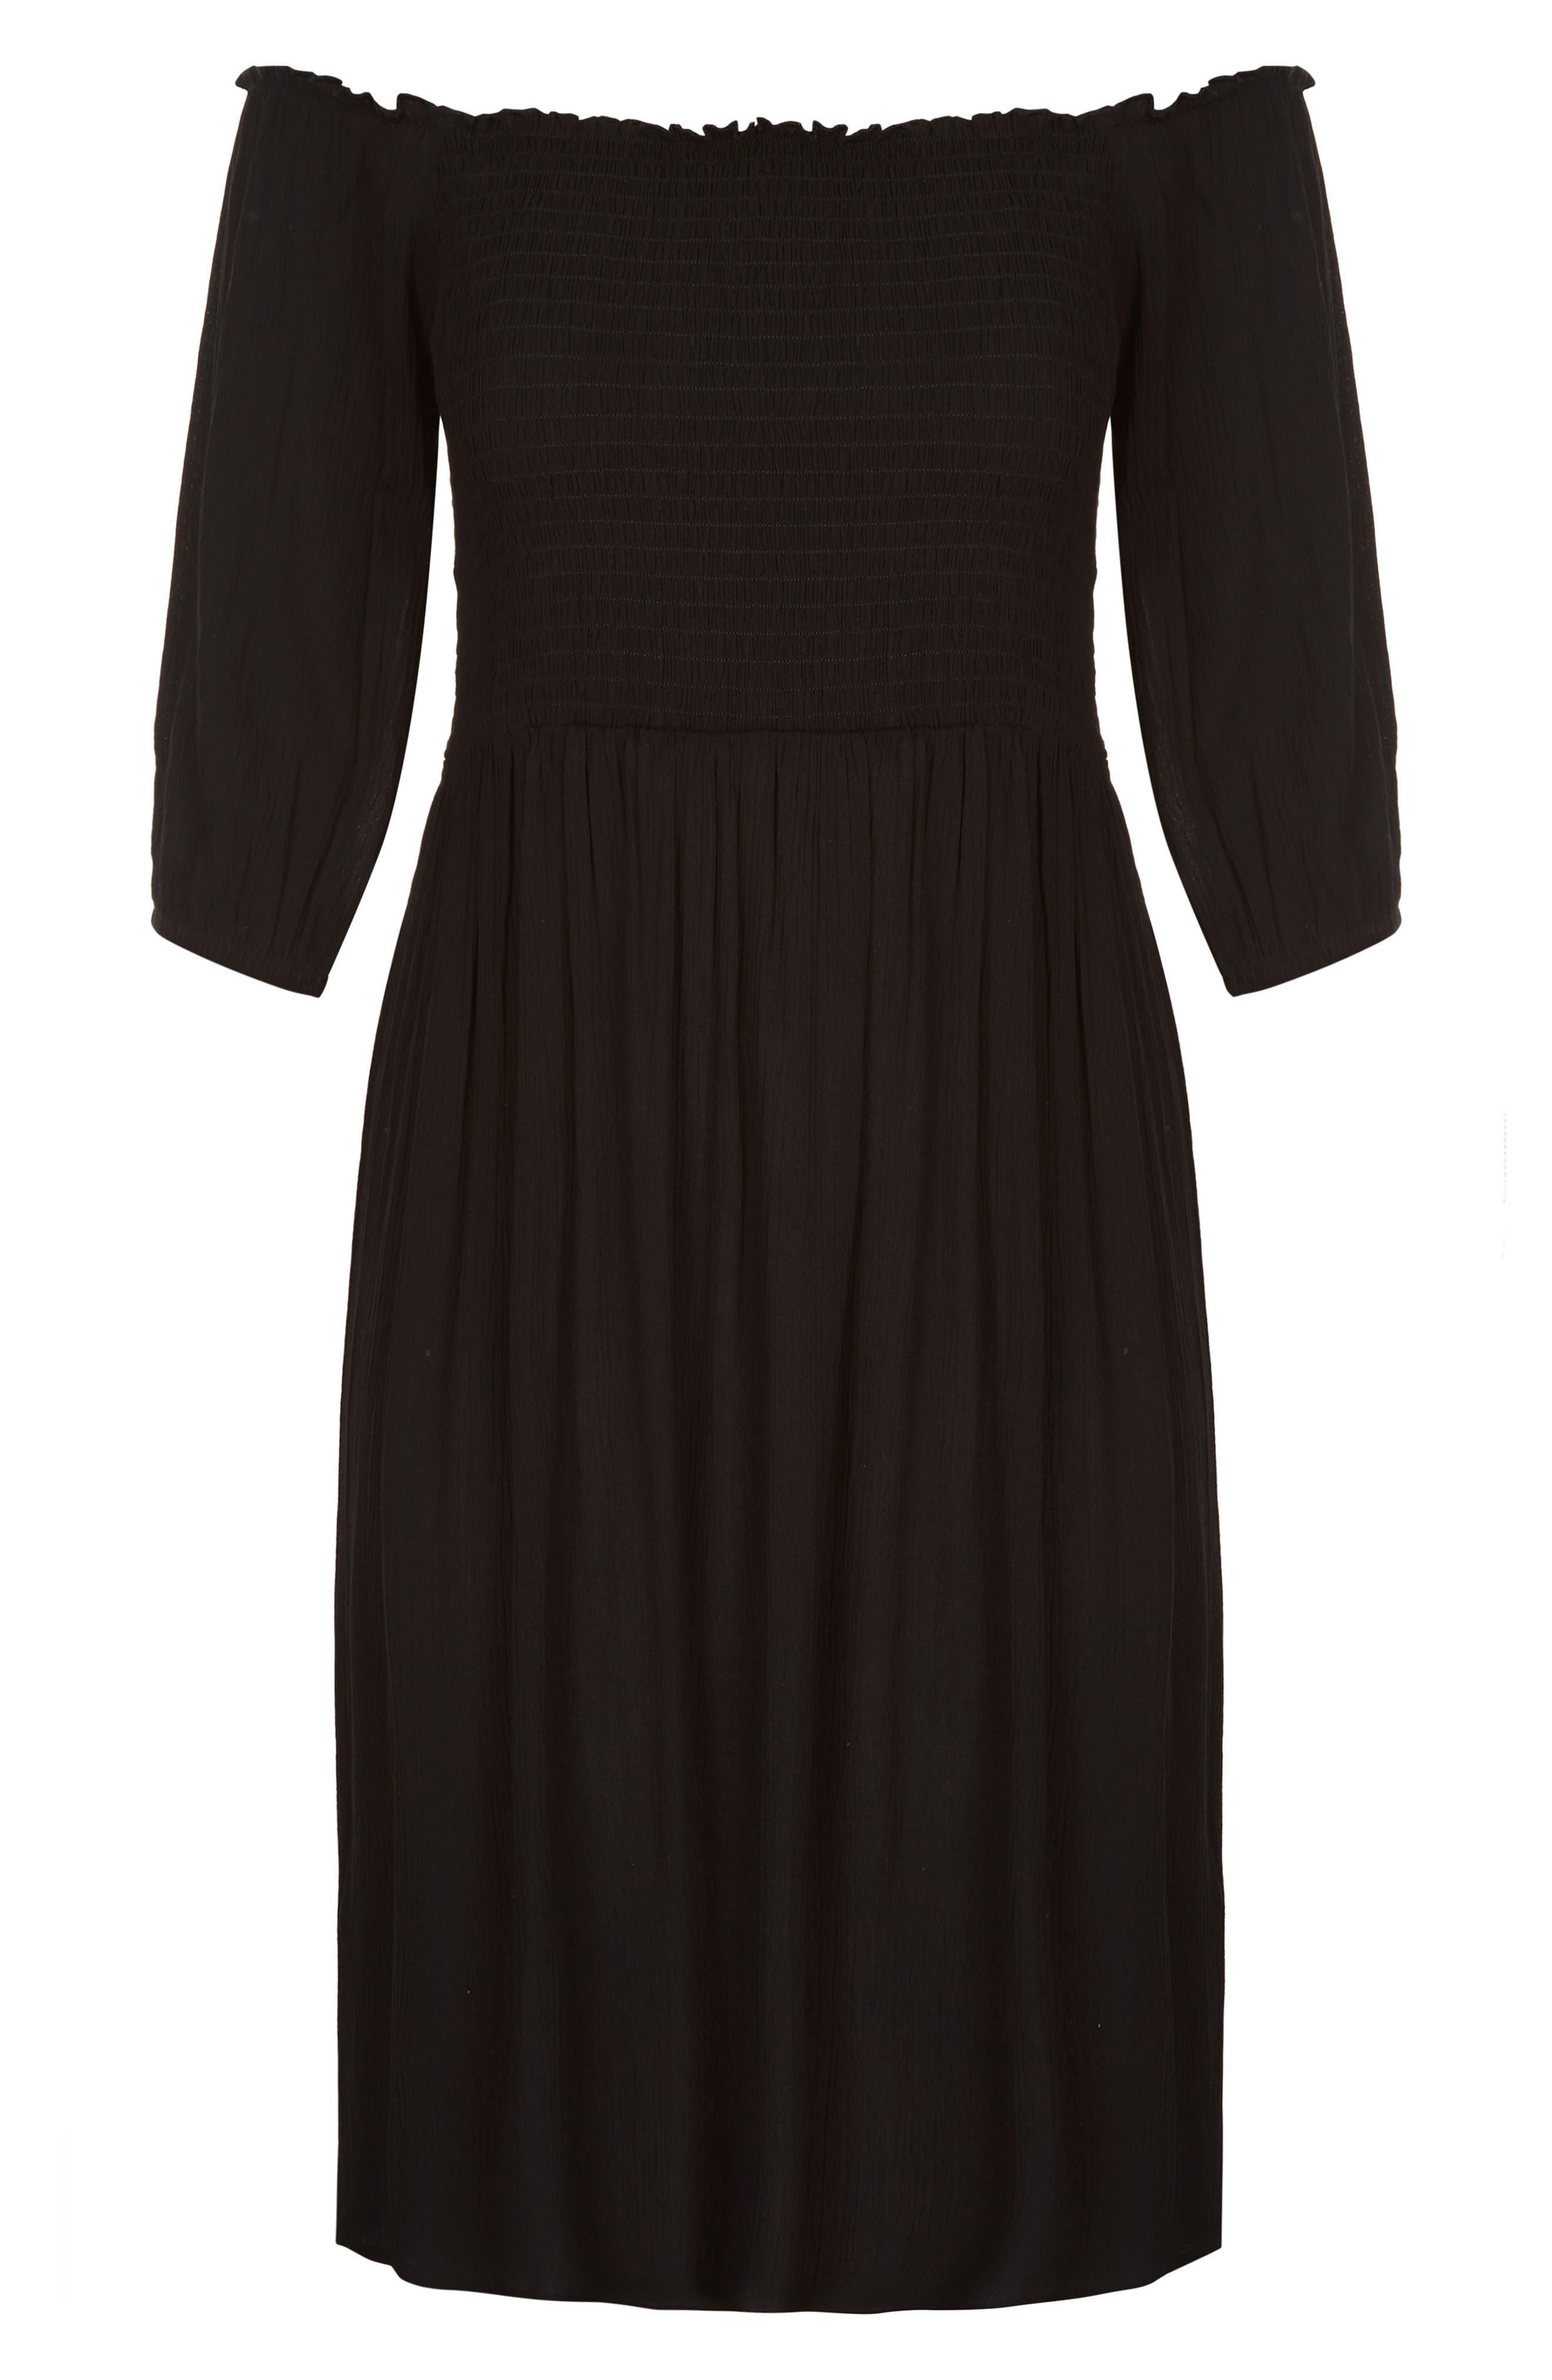 Calista Off the Shoulder Dress,                             Alternate thumbnail 3, color,                             BLACK